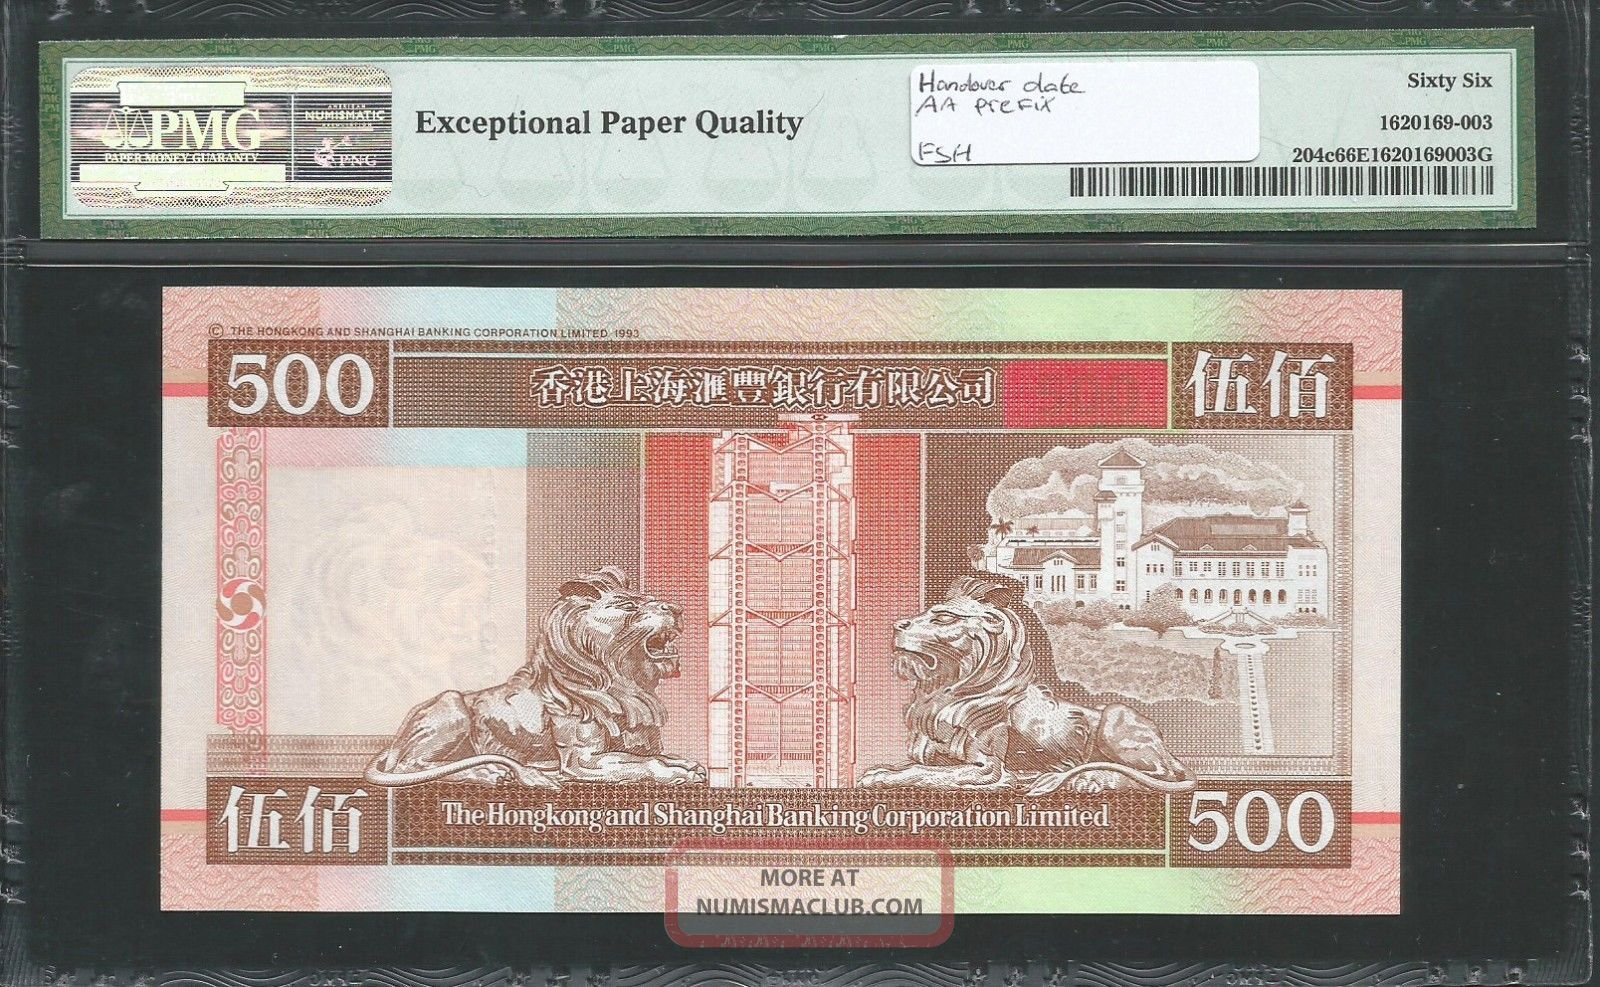 Hong Kong. Hsbc 1997 P - 204c Pmg Gem Unc 66 Epq 500 Dollars Aa Prefix